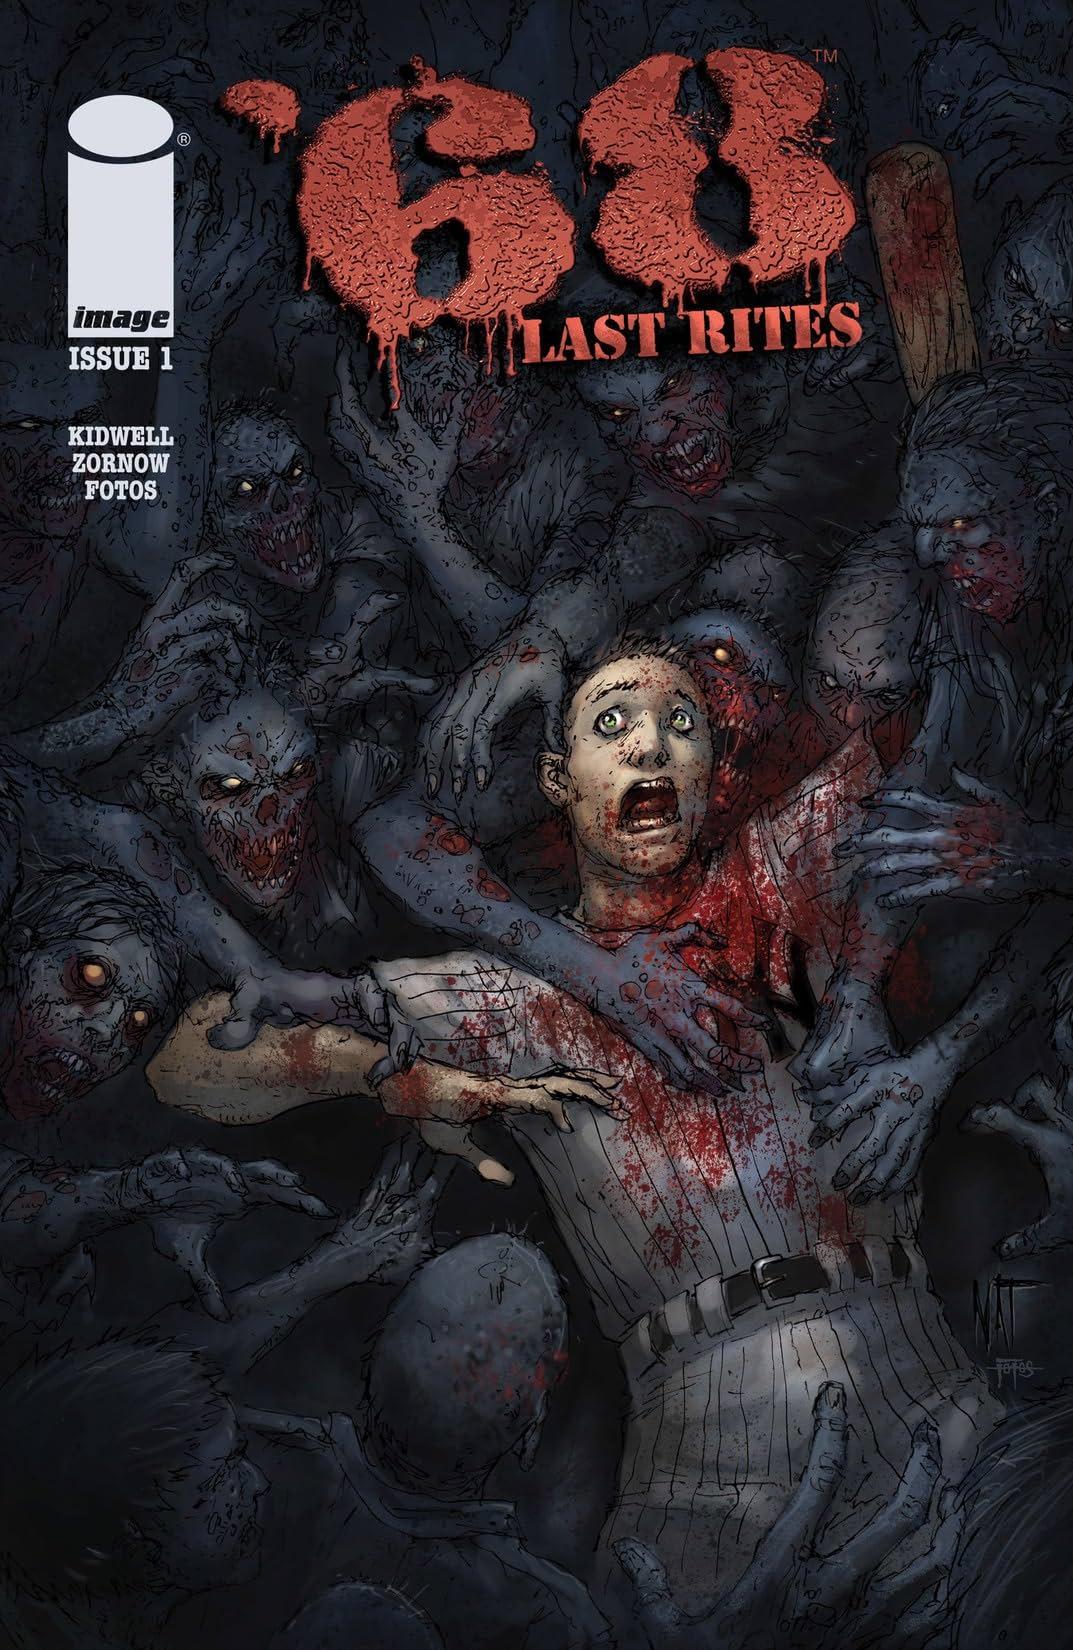 '68 (Sixty-Eight): Last Rites #1 (of 4)